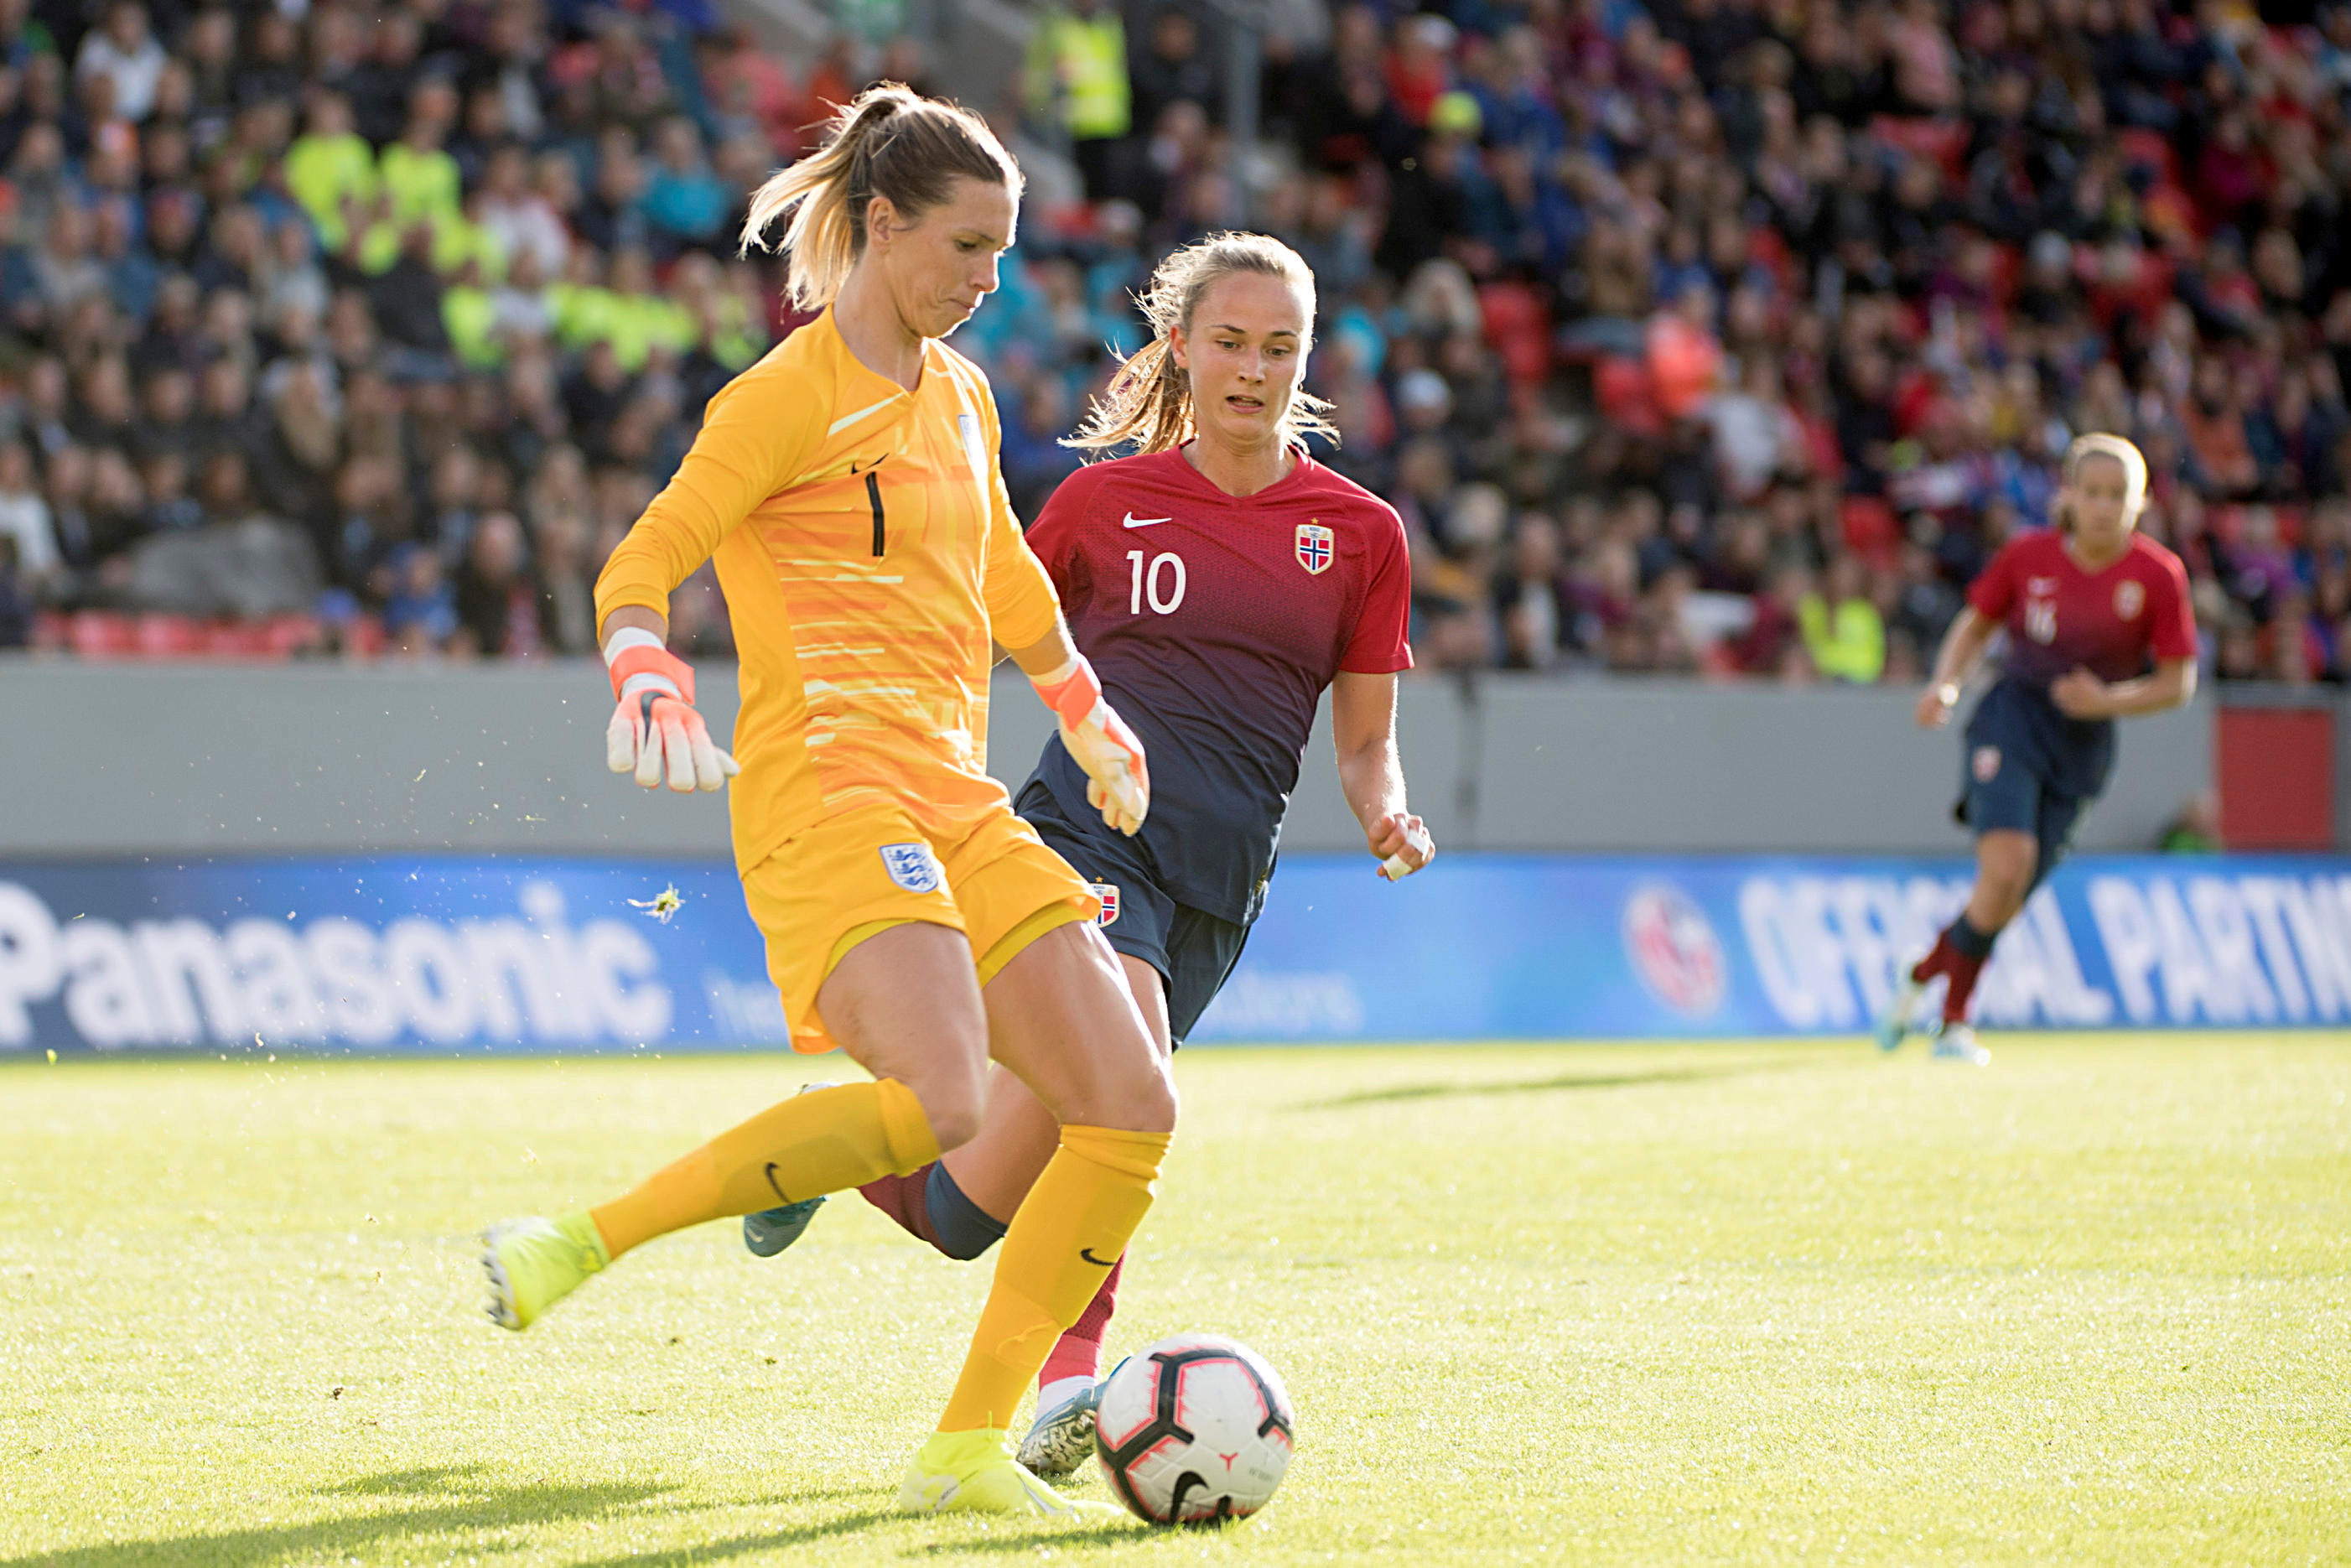 Soccer Football - Women's Friendly - Norway v England - Brann Stadion, Bergen, Norway - September 3, 2019. England's goalkeeper Carly Telford and Norway's Caroline Graham Hansen in action. NTB Scanpix/Marit Hommedal via REUTERS